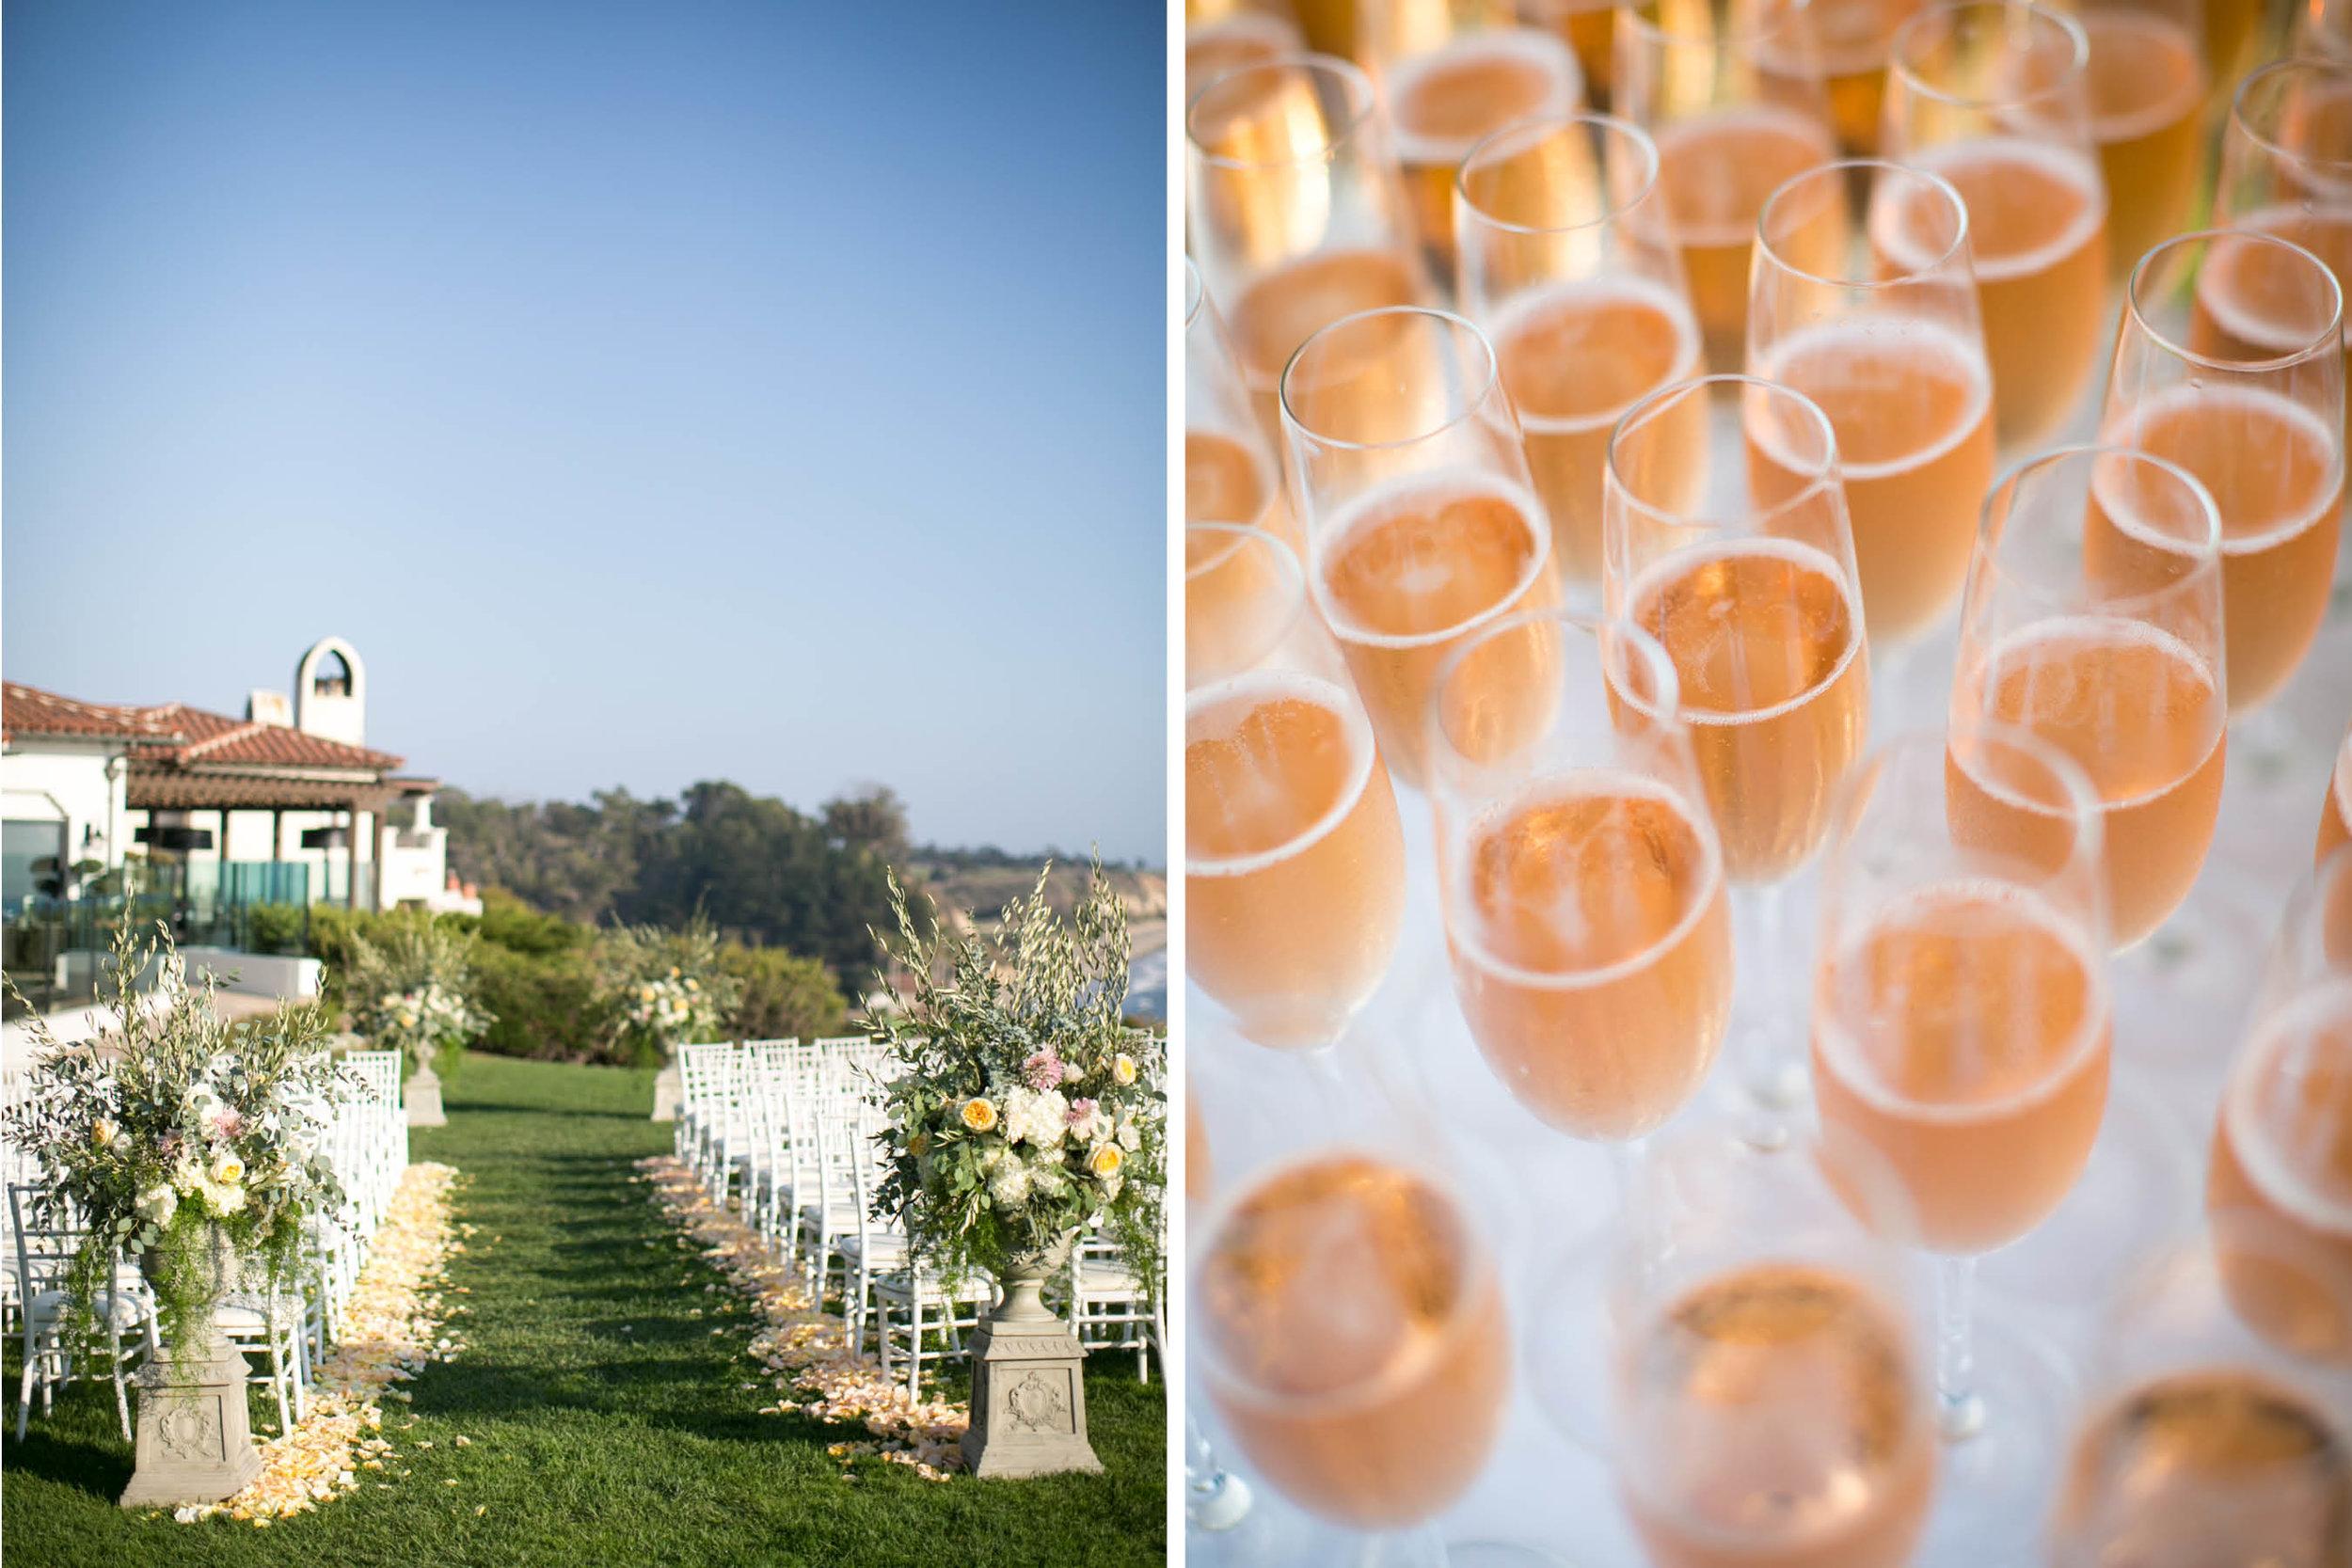 alegria-by-design-wedding-planner-planning-coordinator-day-off-event-design-bacara-resort-ritz-carlton-santa-barbara-garden-ocean-view-location-venue-patio (8).jpg